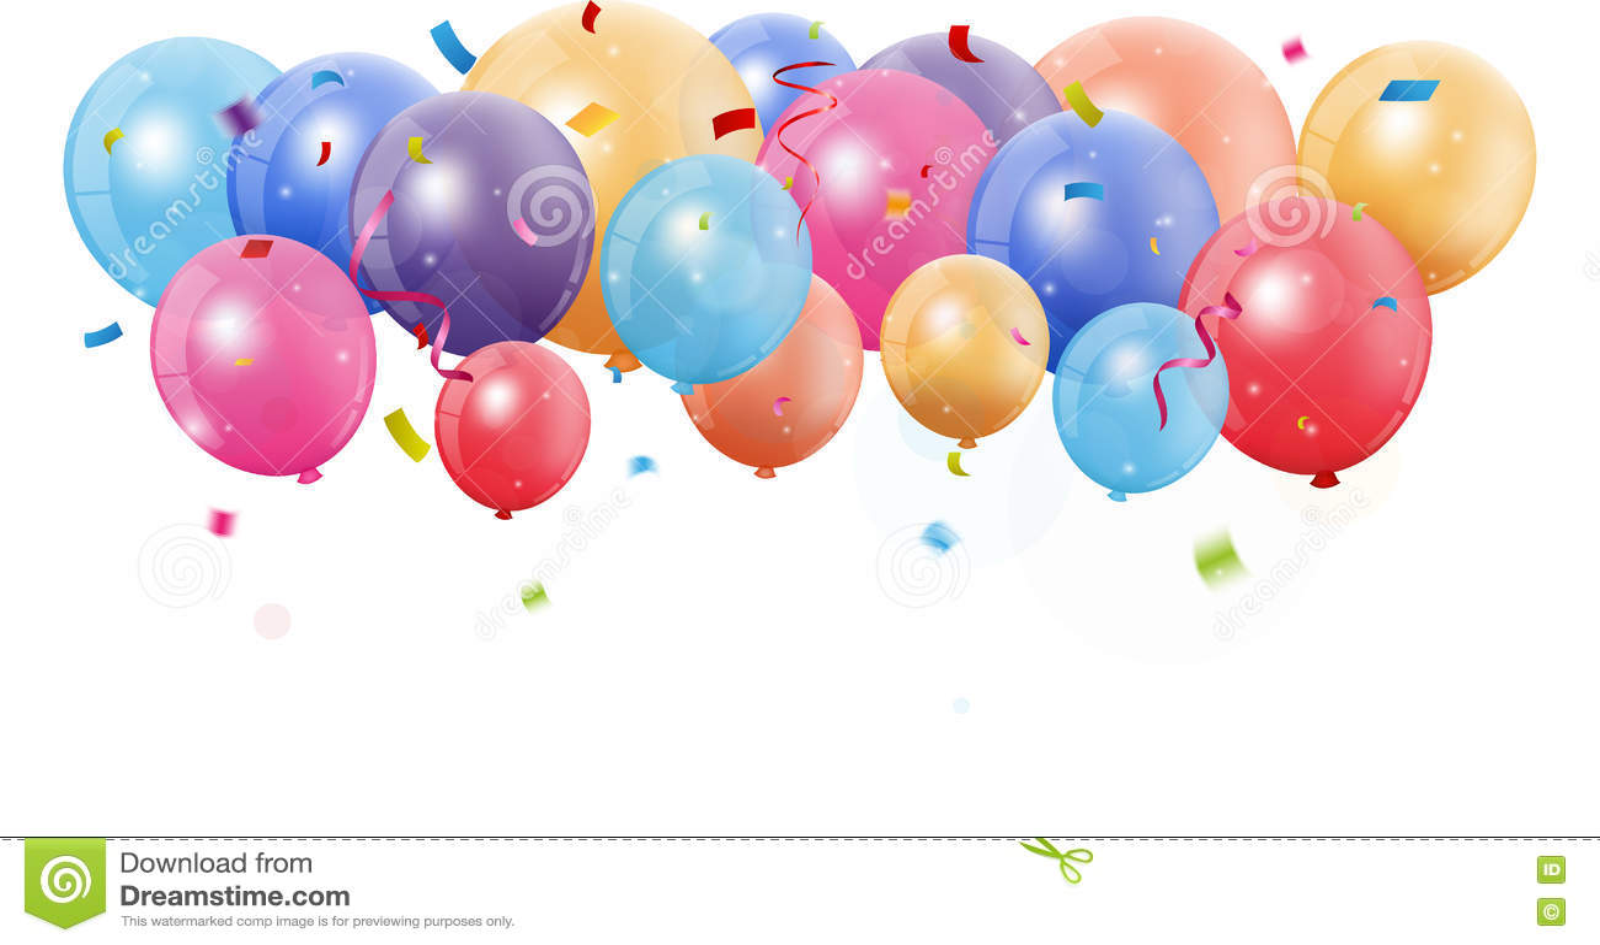 Bunter Geburtstagsballon Mit Konfettis Vektor Abbildung